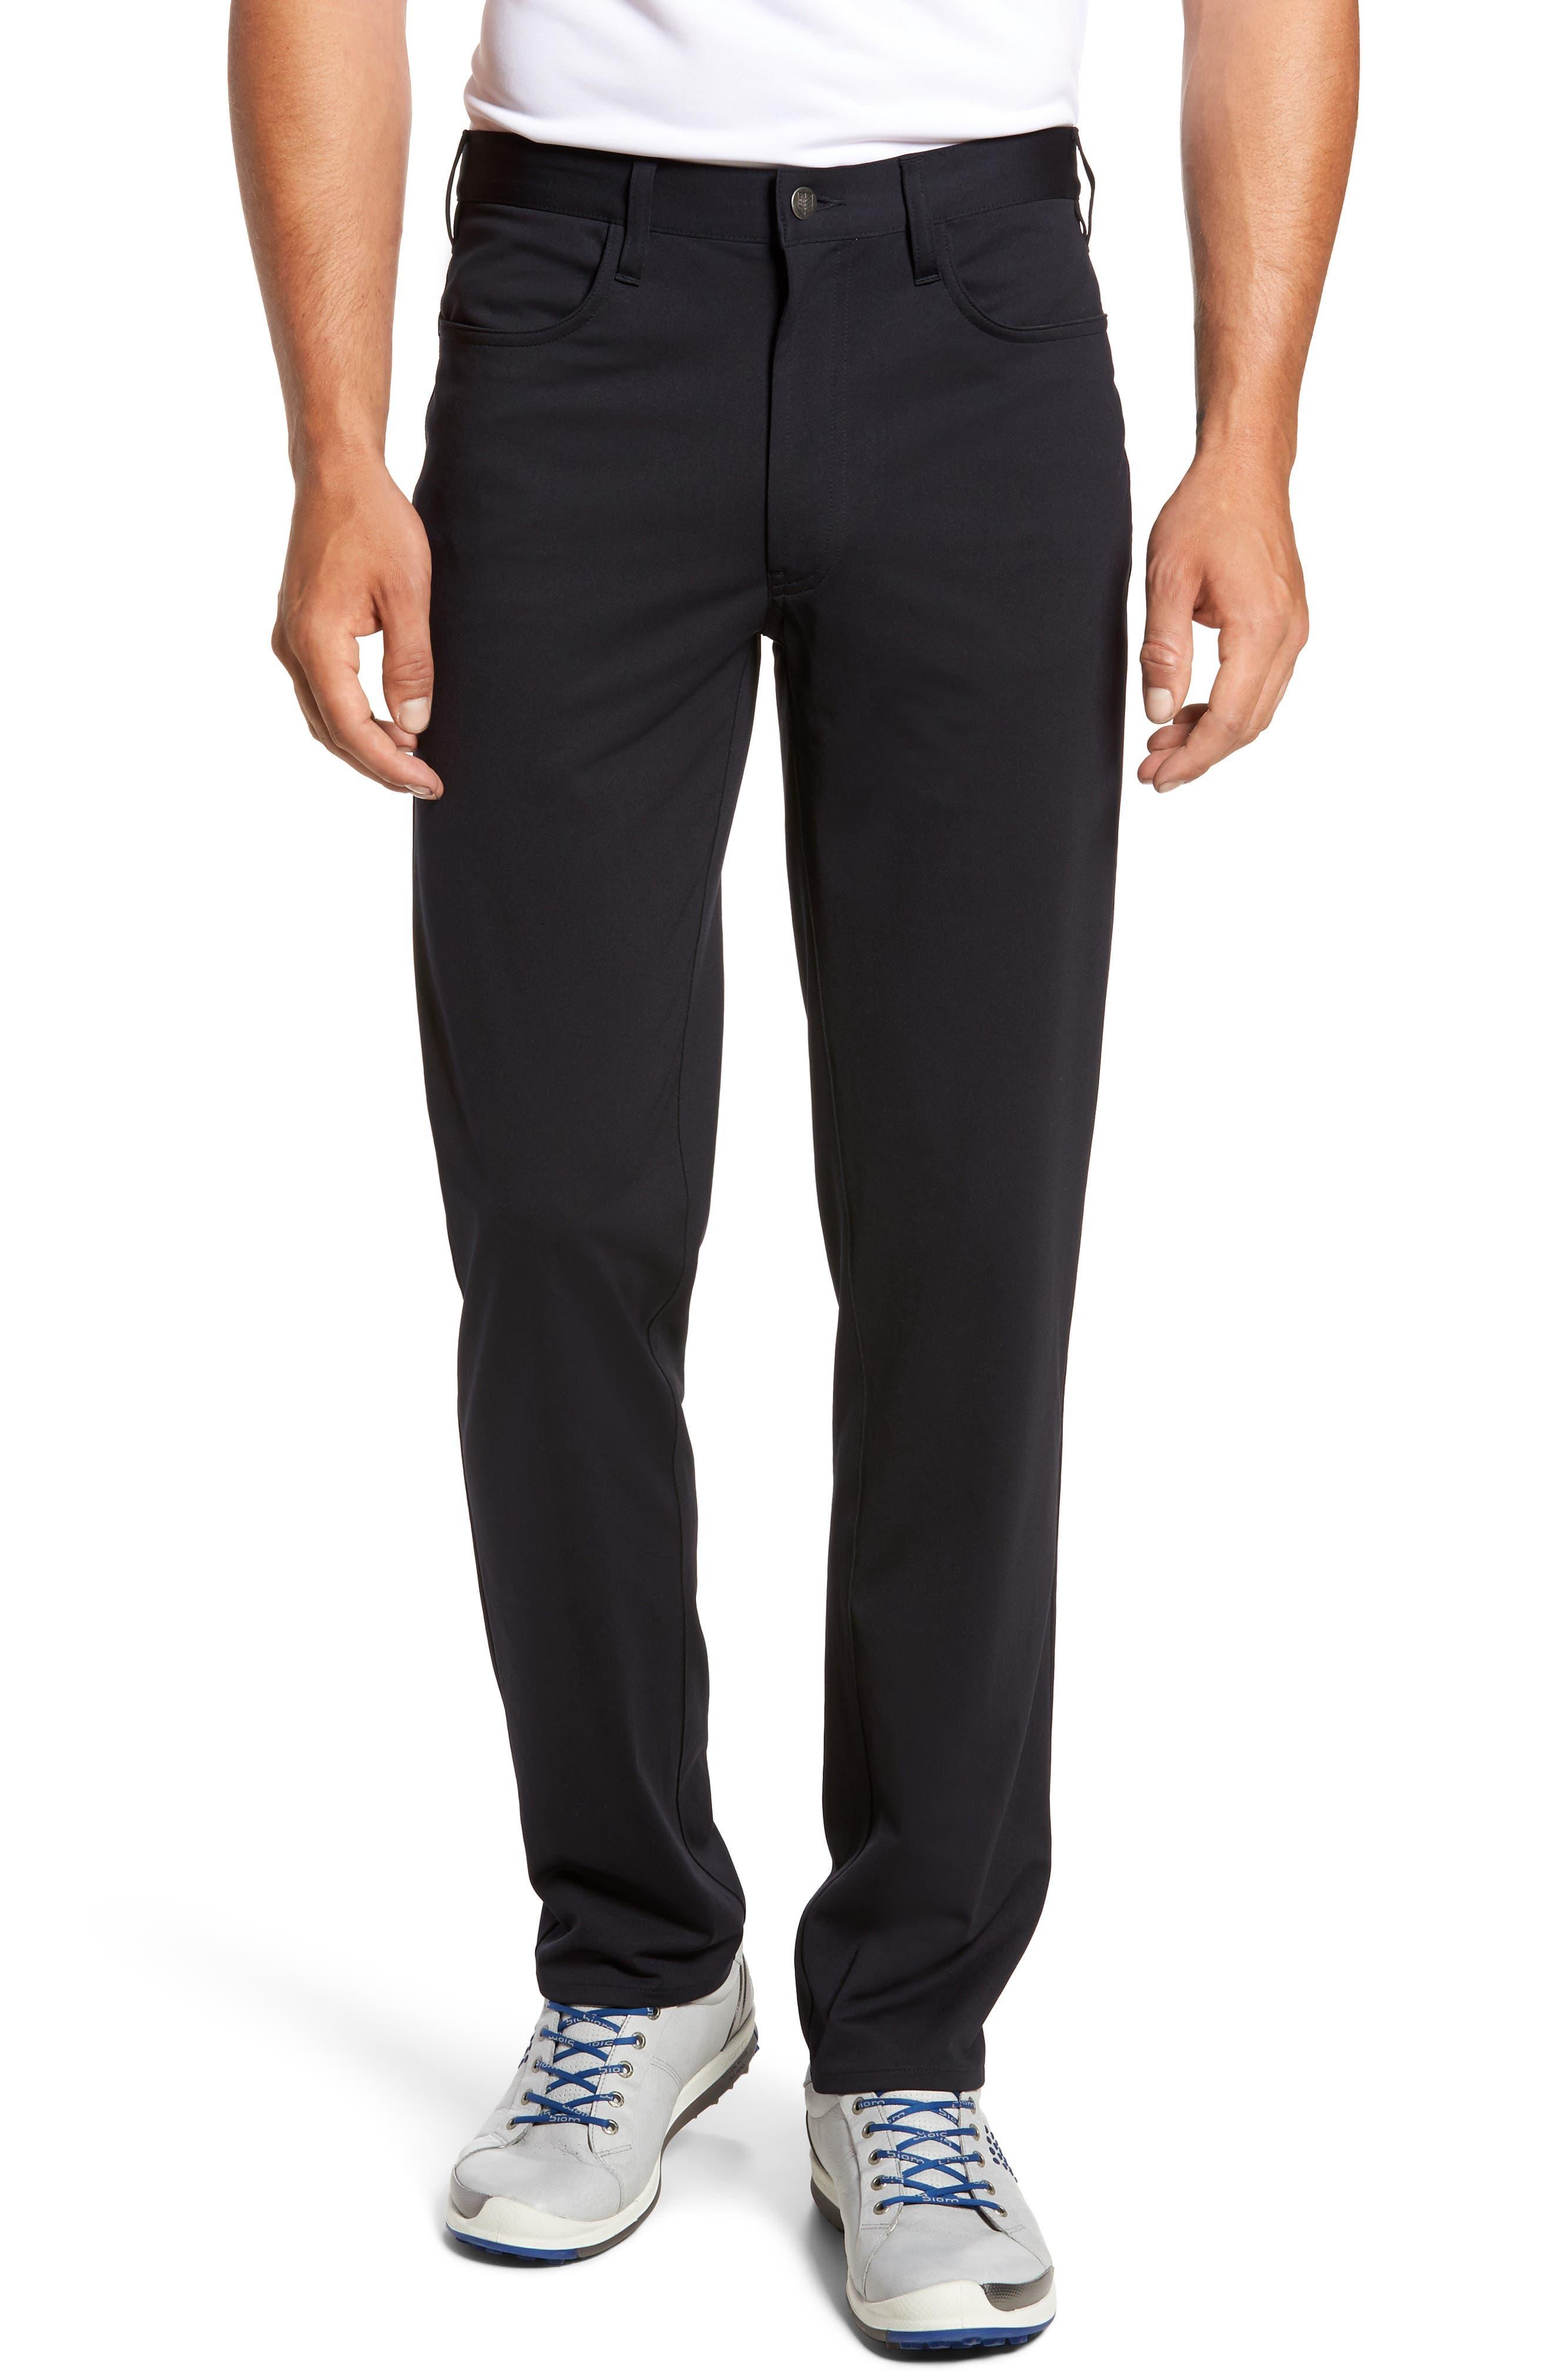 R18 Tech Pants,                             Main thumbnail 1, color,                             BLACK